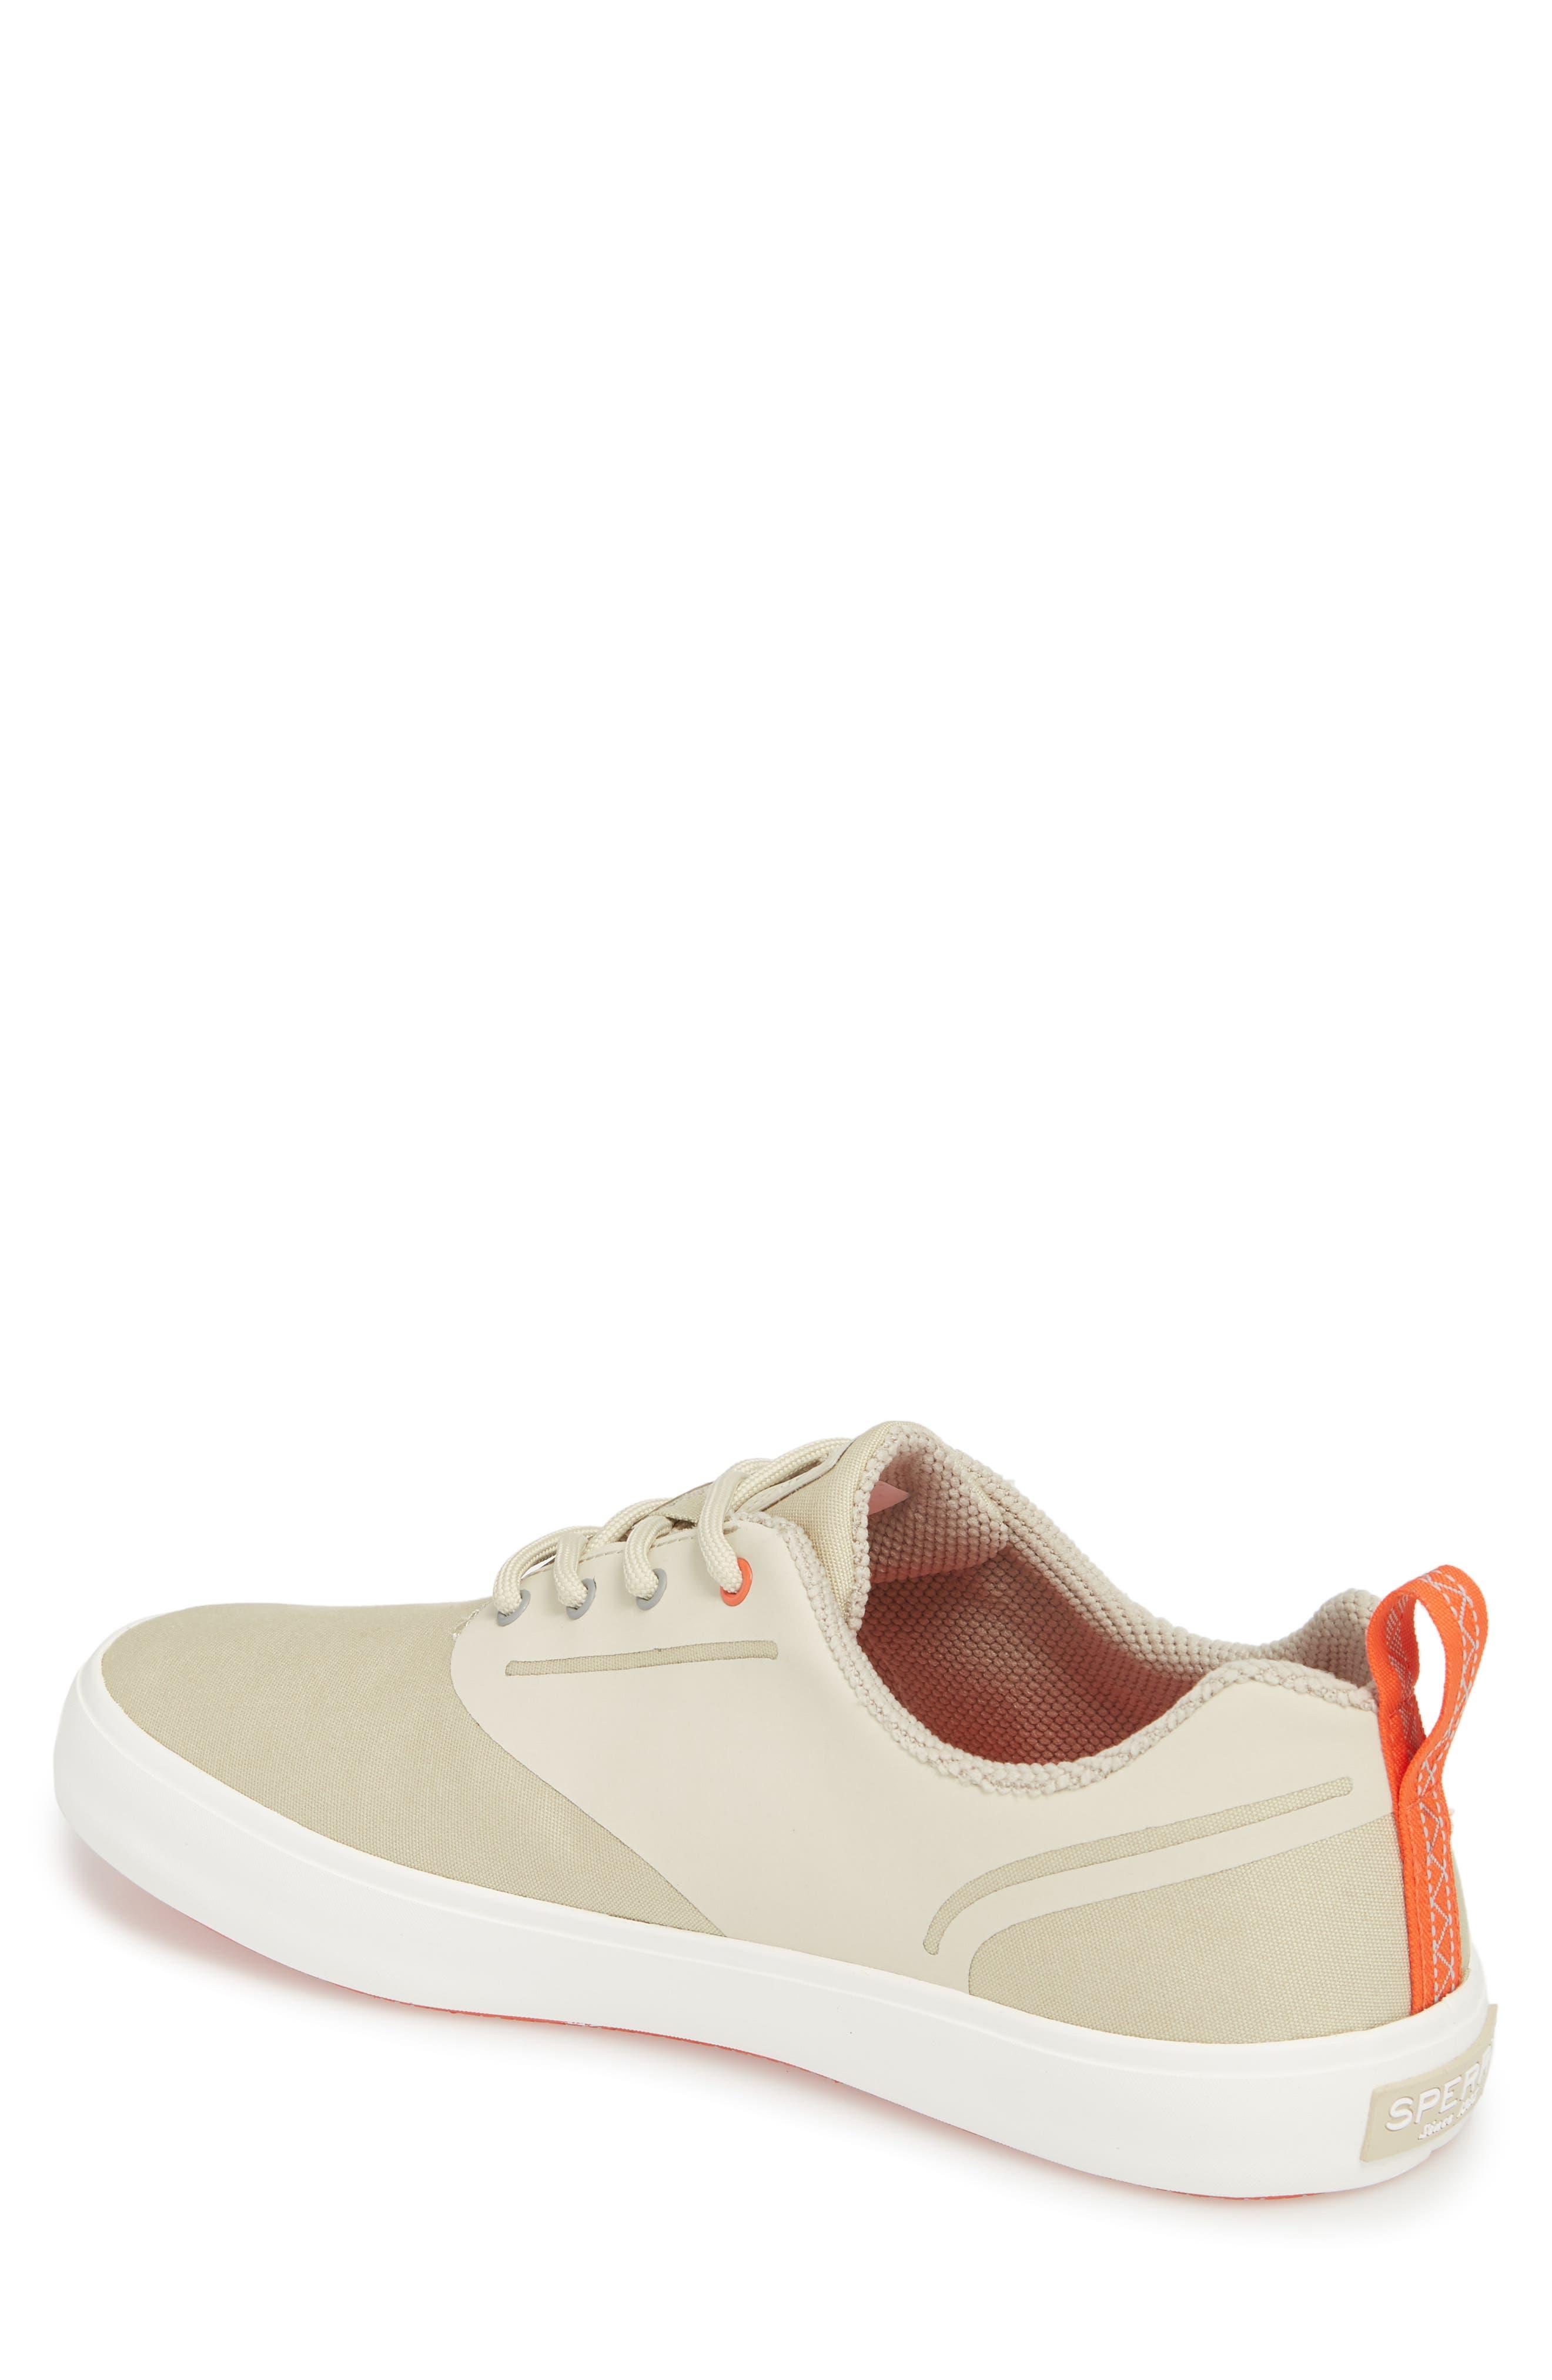 Flex Deck CVO Sneaker,                             Alternate thumbnail 2, color,                             BEIGE